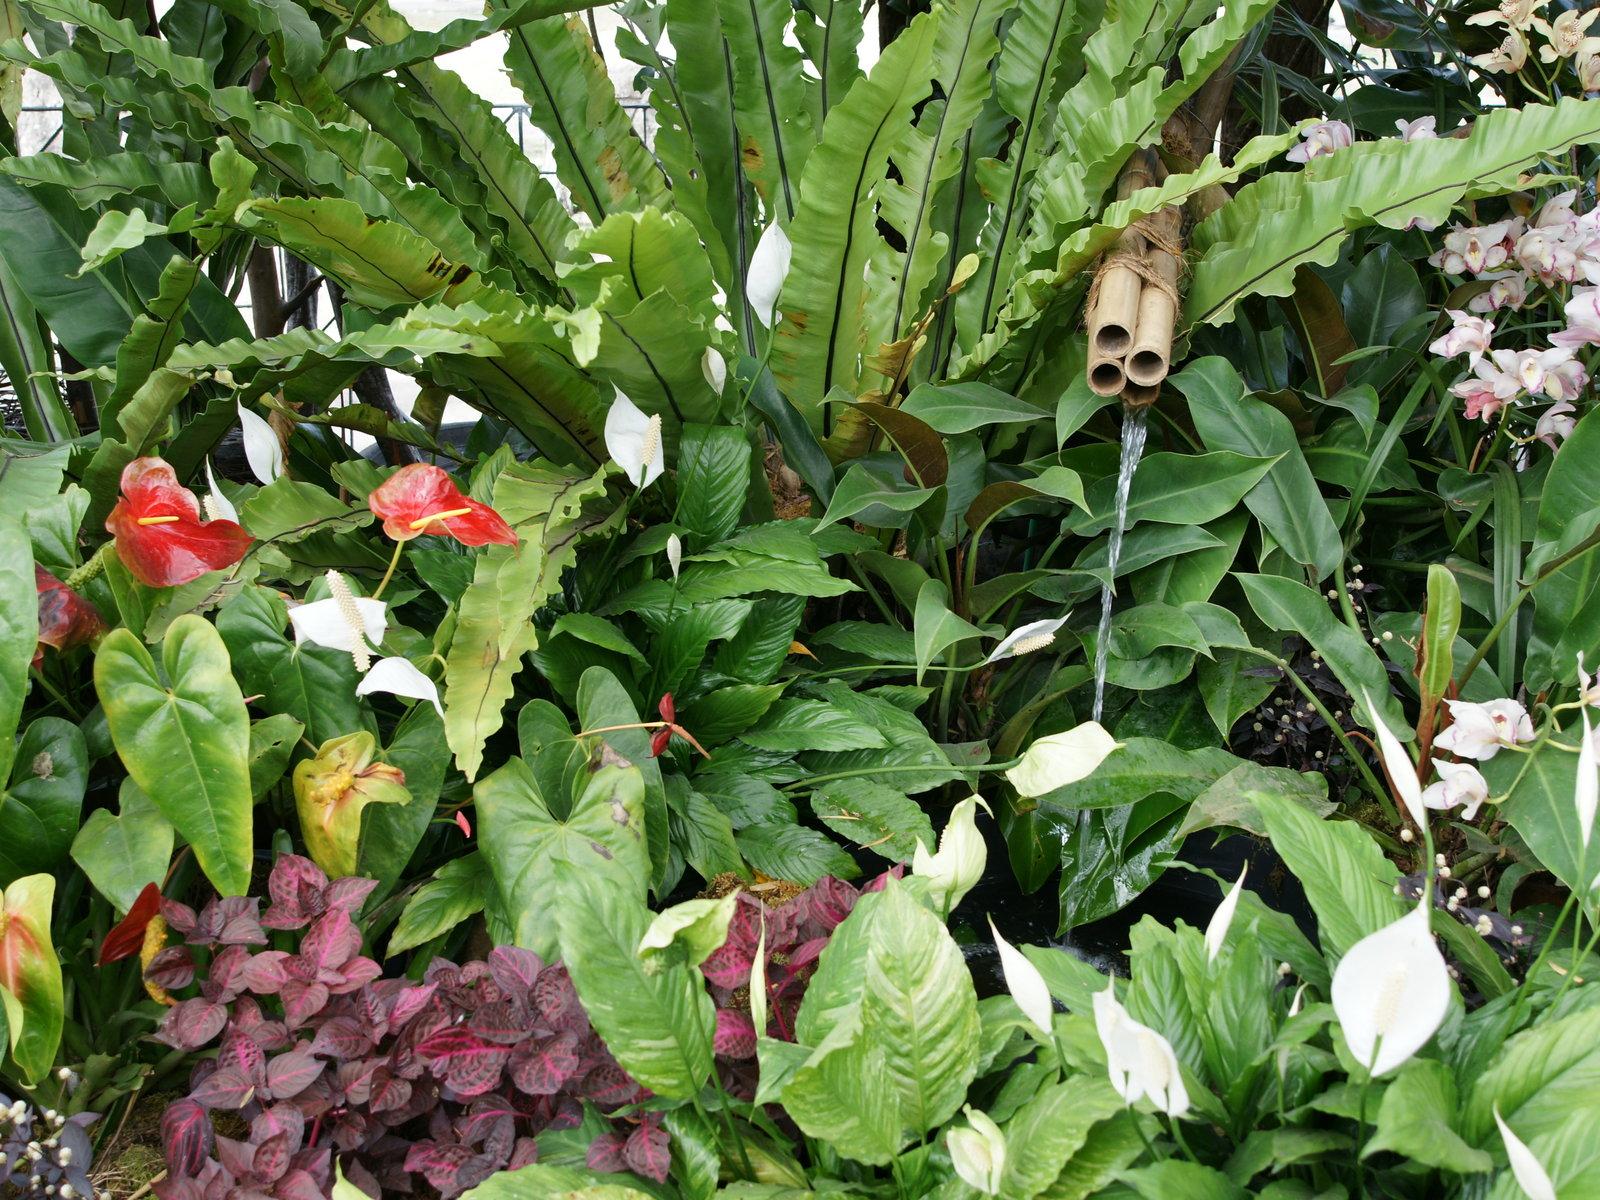 Jardin fleurs tropicales for Plantas tropicales de exterior